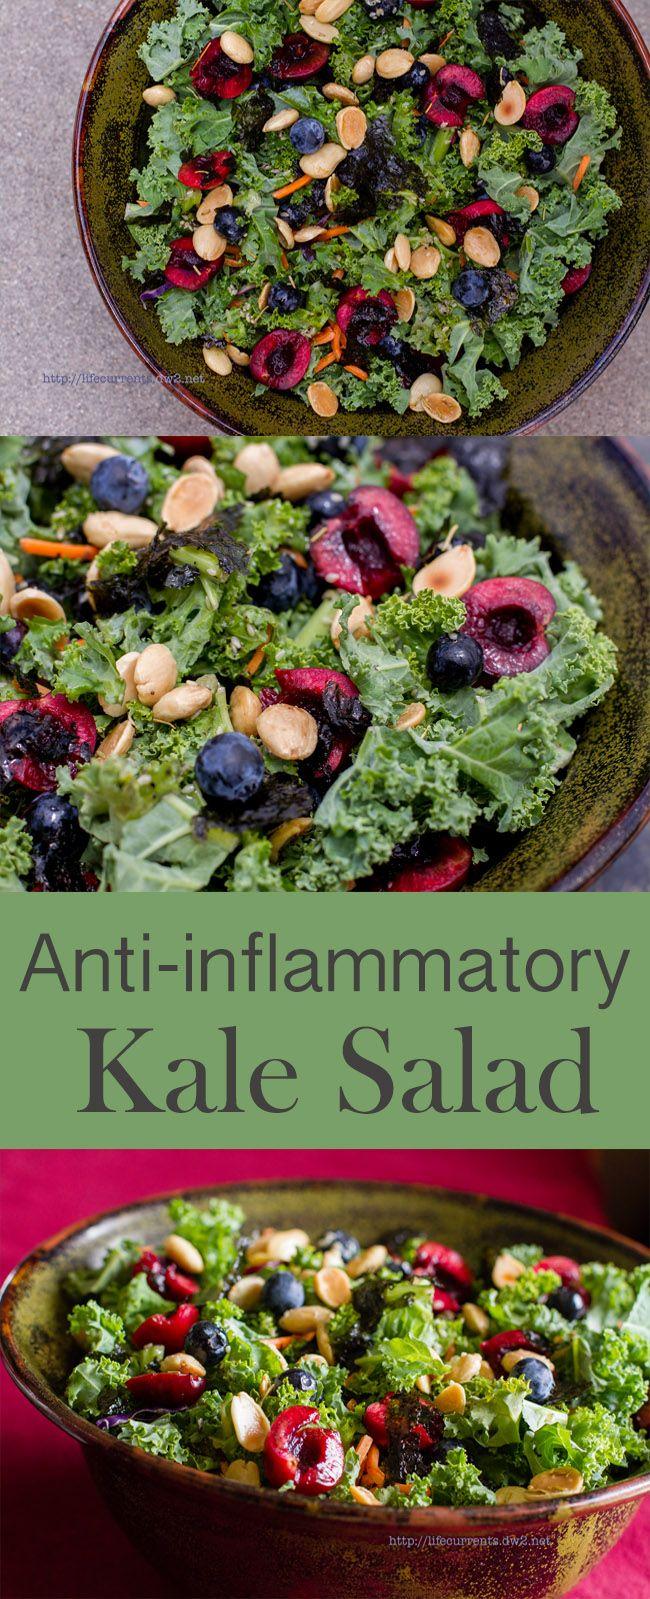 Anti-inflammatory Kale Salad